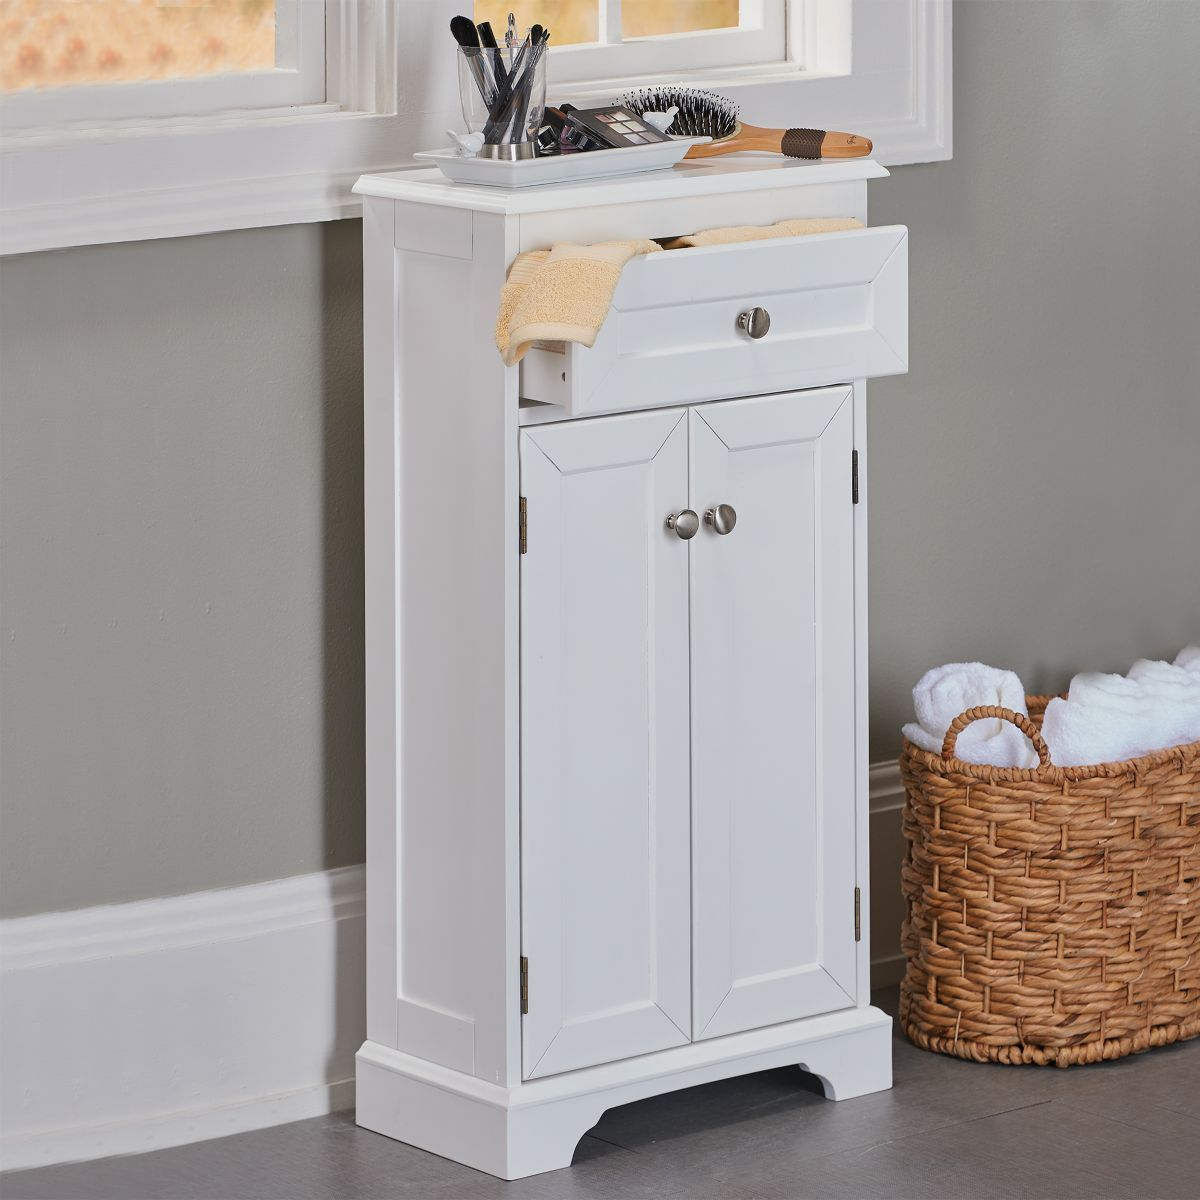 Weatherby Bathroom Narrow Bath Cabinet With Drawer White Bathroom Cabinets Small White Bathroom Cabinet Slimline Bathroom Storage [ 1200 x 1200 Pixel ]